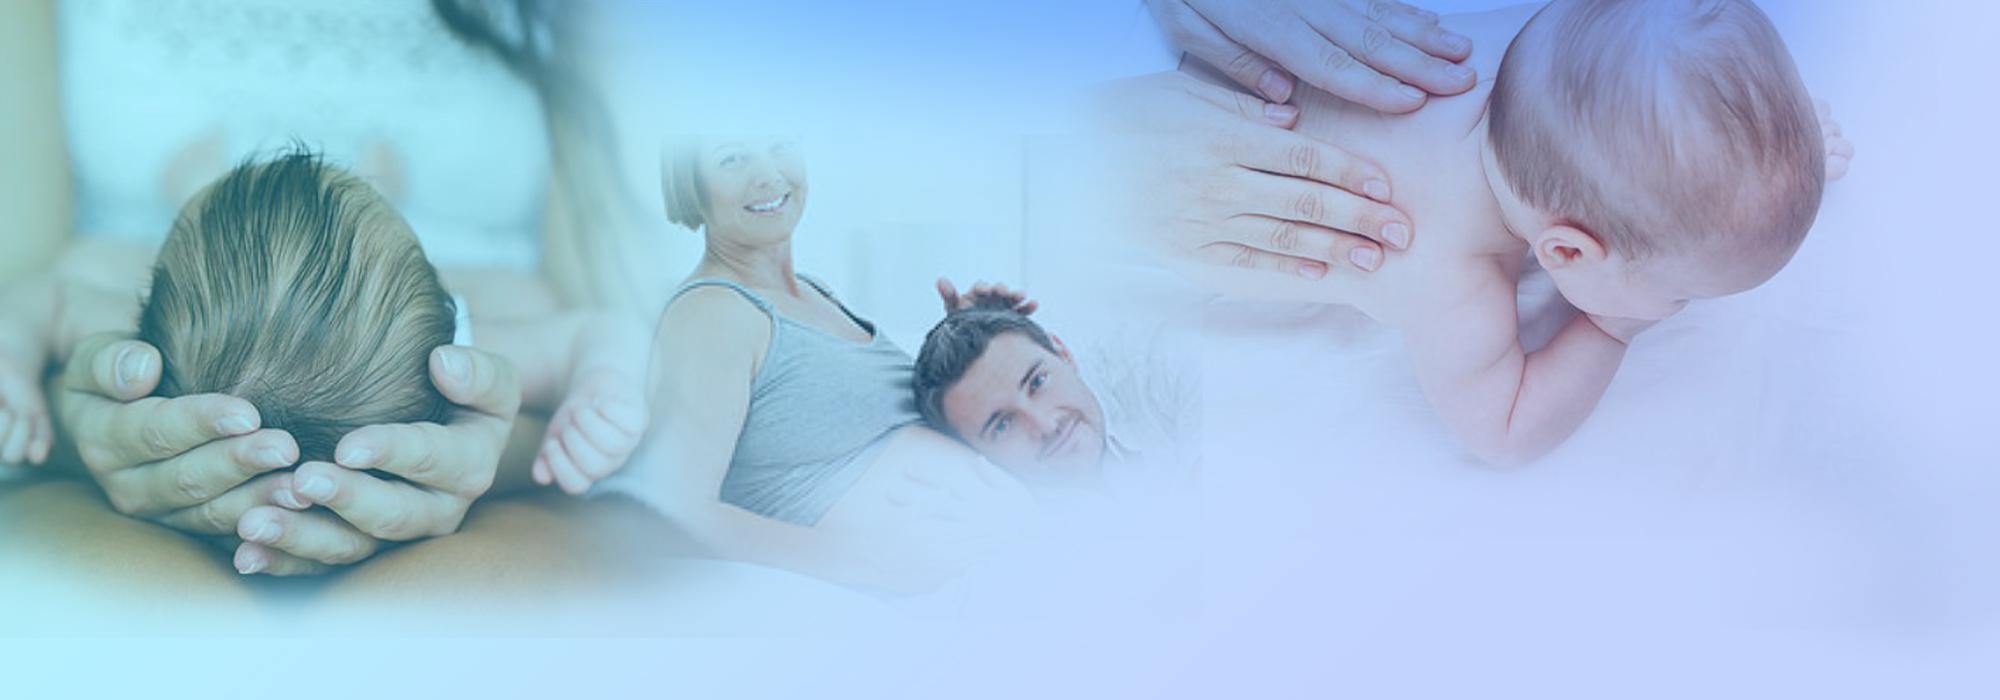 femme enceinte aide la grossesse physio masso mp 450 569 4774. Black Bedroom Furniture Sets. Home Design Ideas